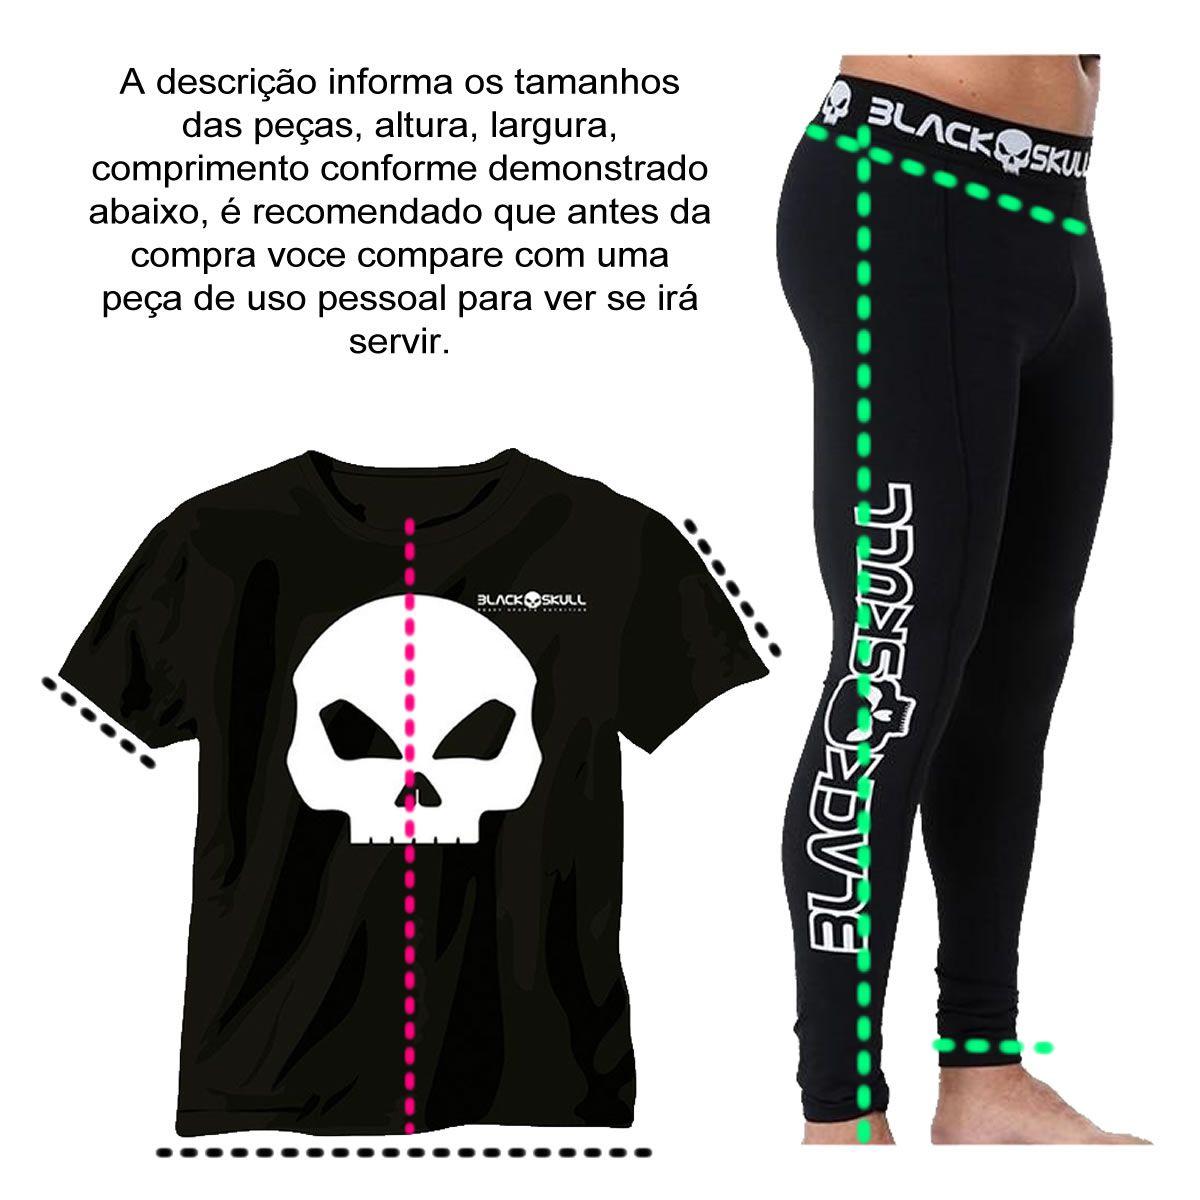 Top Squadrow Camuflado - Black Skull